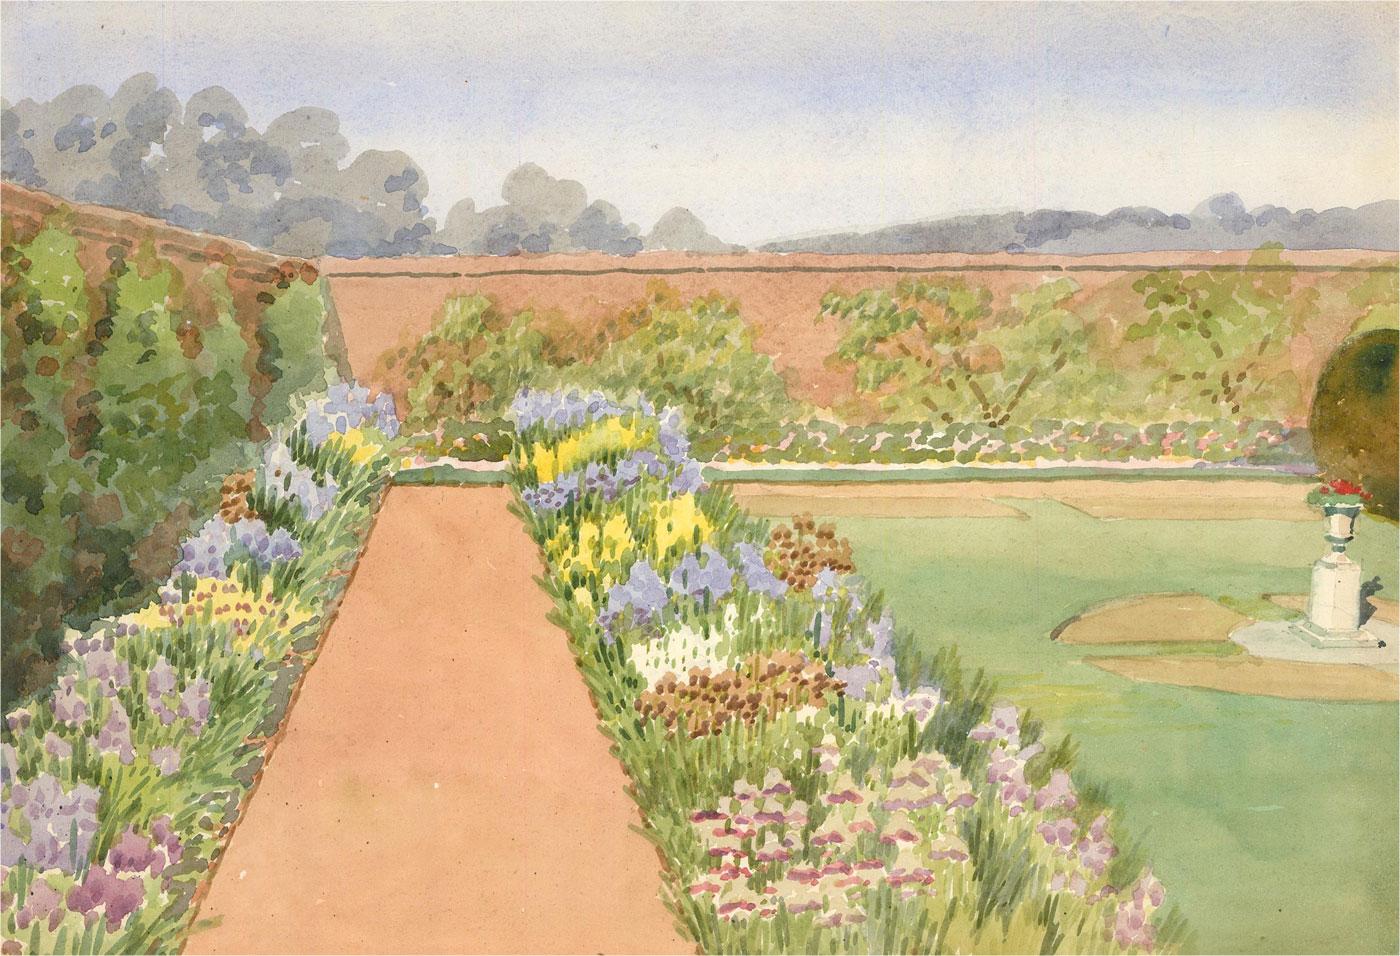 Raymond Turner Barker (1872-1945) - 1931 Watercolour, Walled Garden